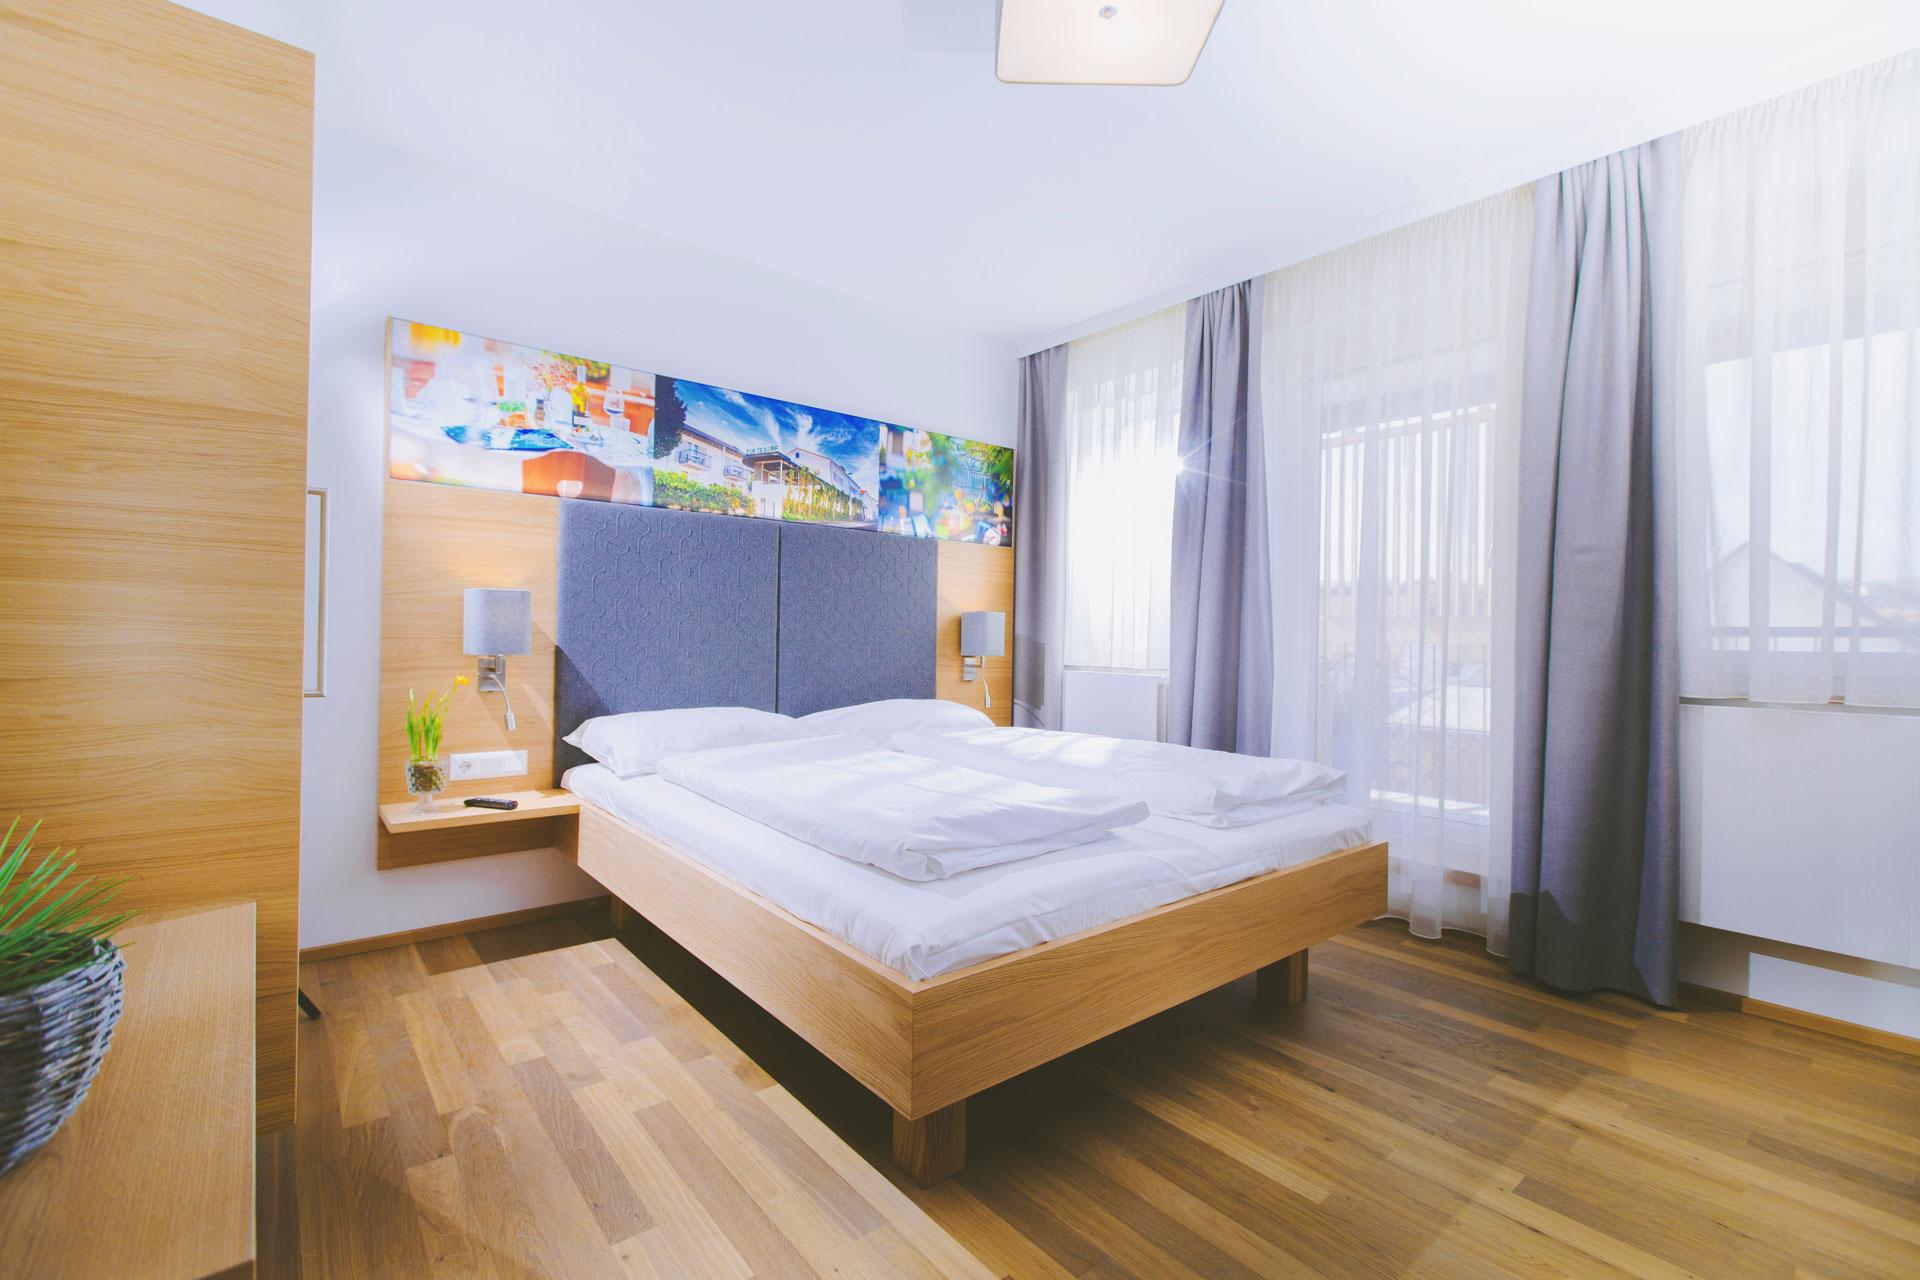 gasthof-zur-traube-doppelzimmer6